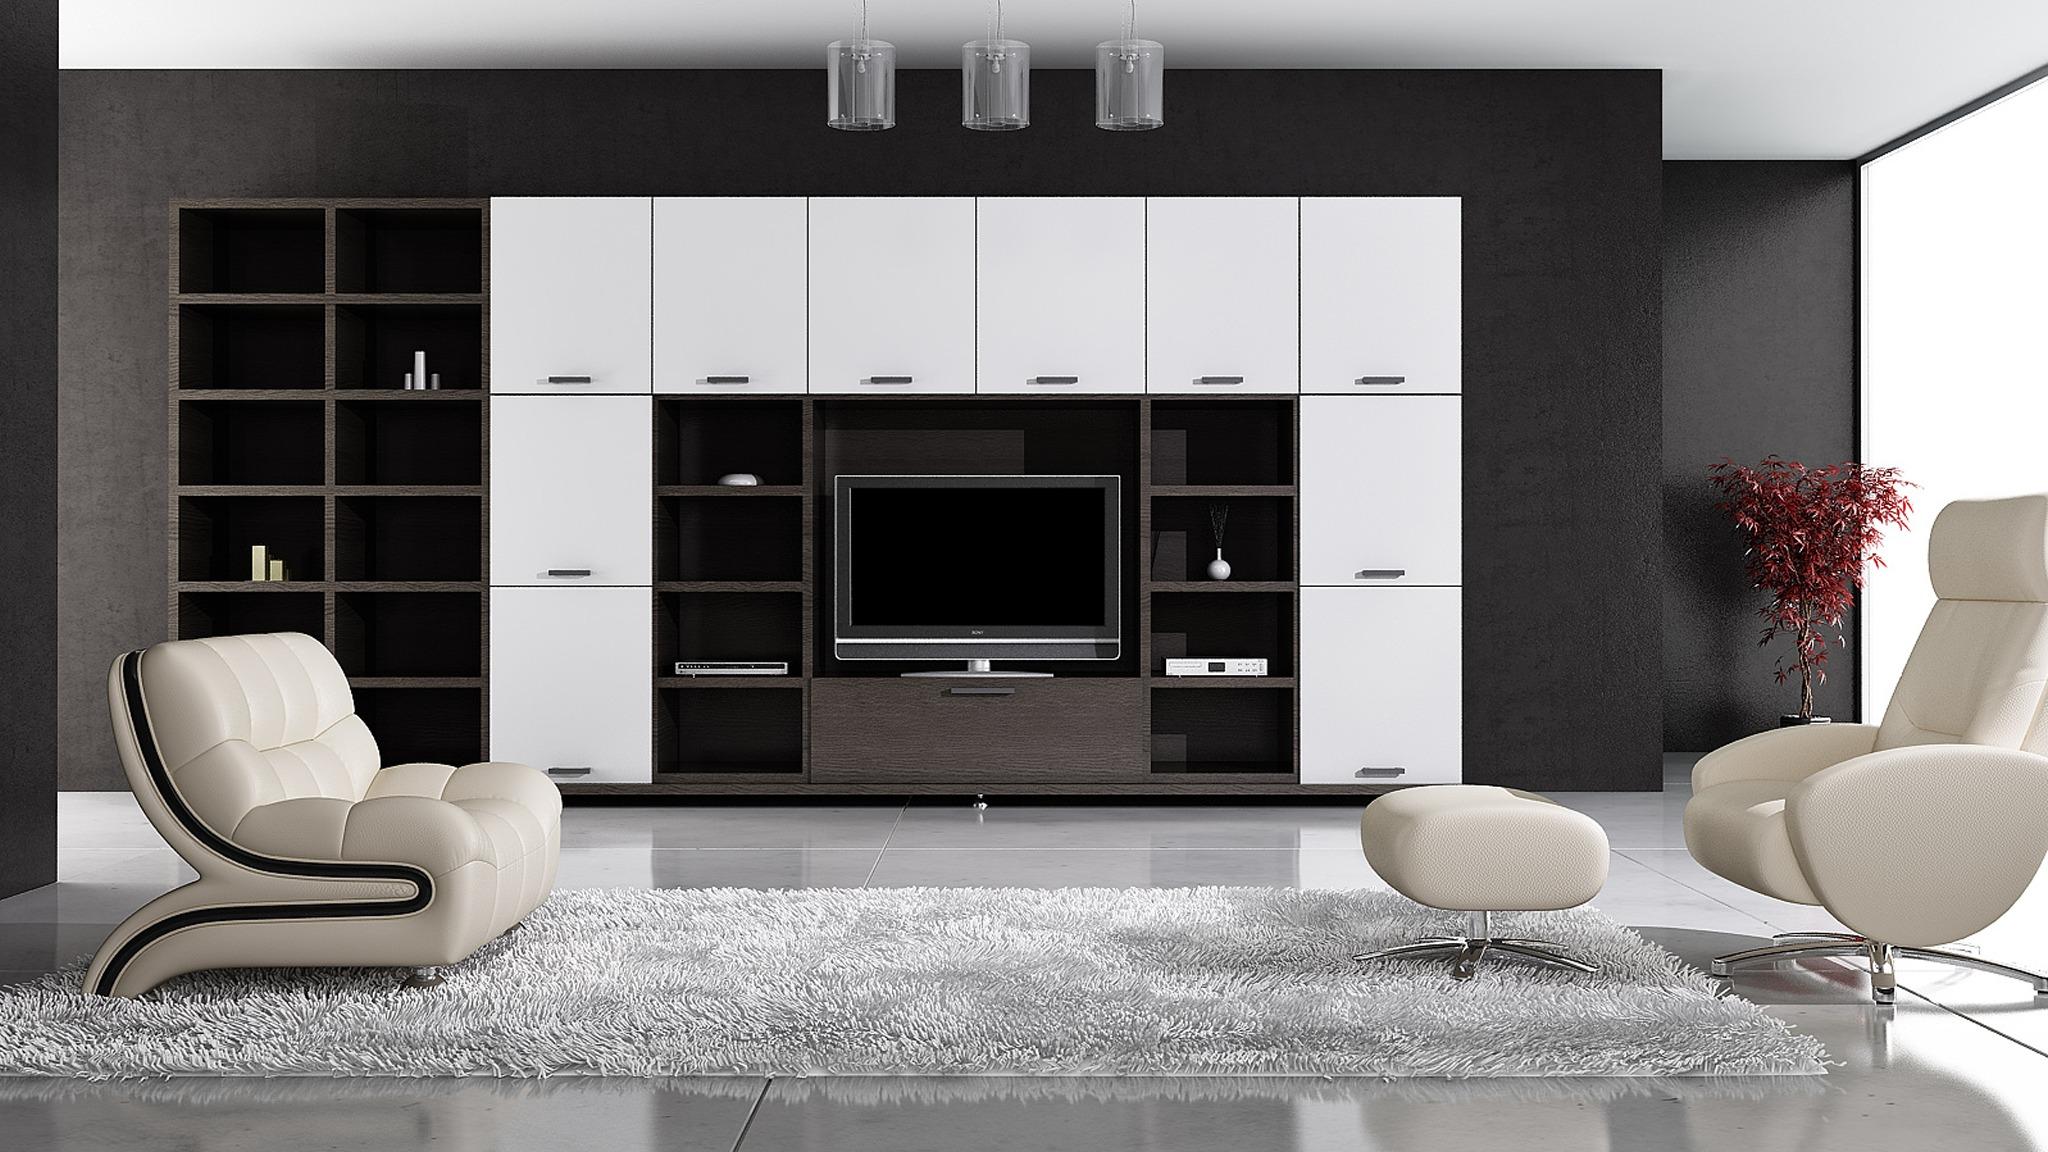 Living Room Chair Ottoman Download Wallpaper Room Carpet Chair Tv Floor Wardrobe